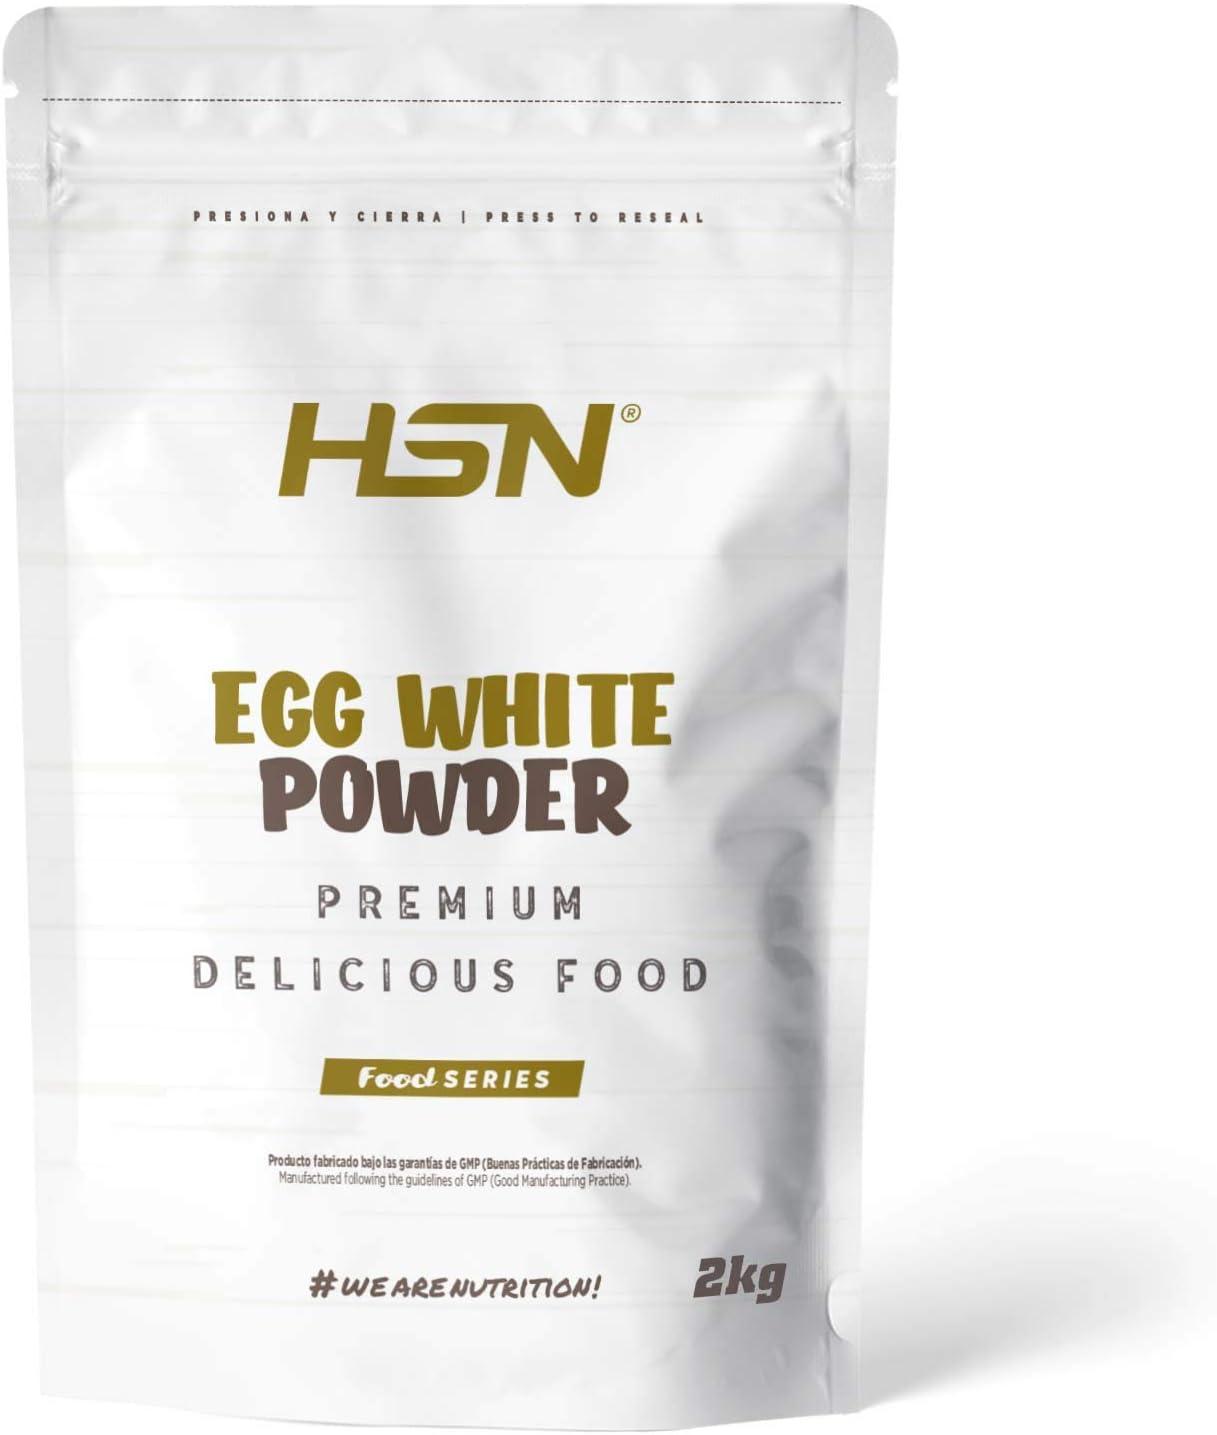 HSN Albumina de Huevo 100% Clara de Huevo en Polvo Deshidratada | Proteína Natural | Sin Grasas, Sin Colesterol, Vegetariano, Sin Gluten, Sin Lactosa, ...